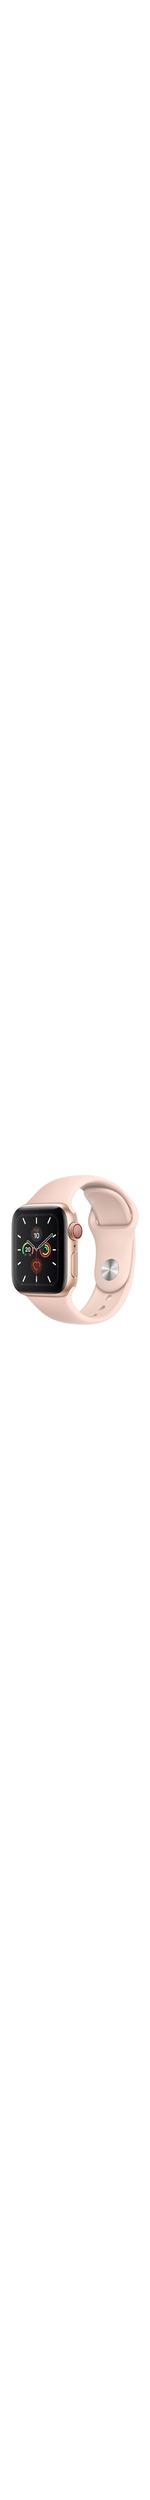 Apple Watch Series 5 Smart Watch - Wrist Wearable - Gold Aluminum Case - Pink Sand Band - Aluminium Case - Cellular Phone Capability - LTE, UMTS